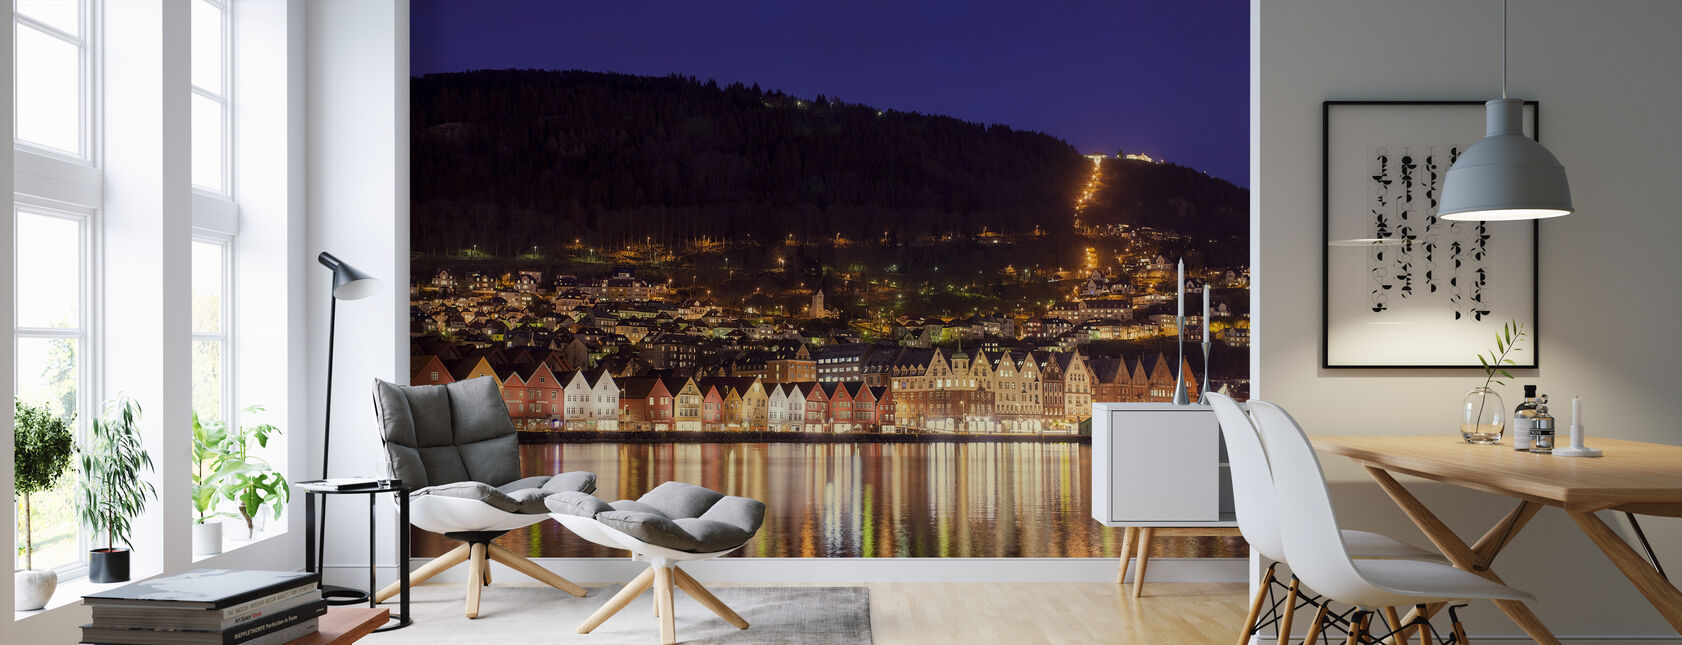 Fargerike Hus i Bergen, Norge - Tapet - Stue